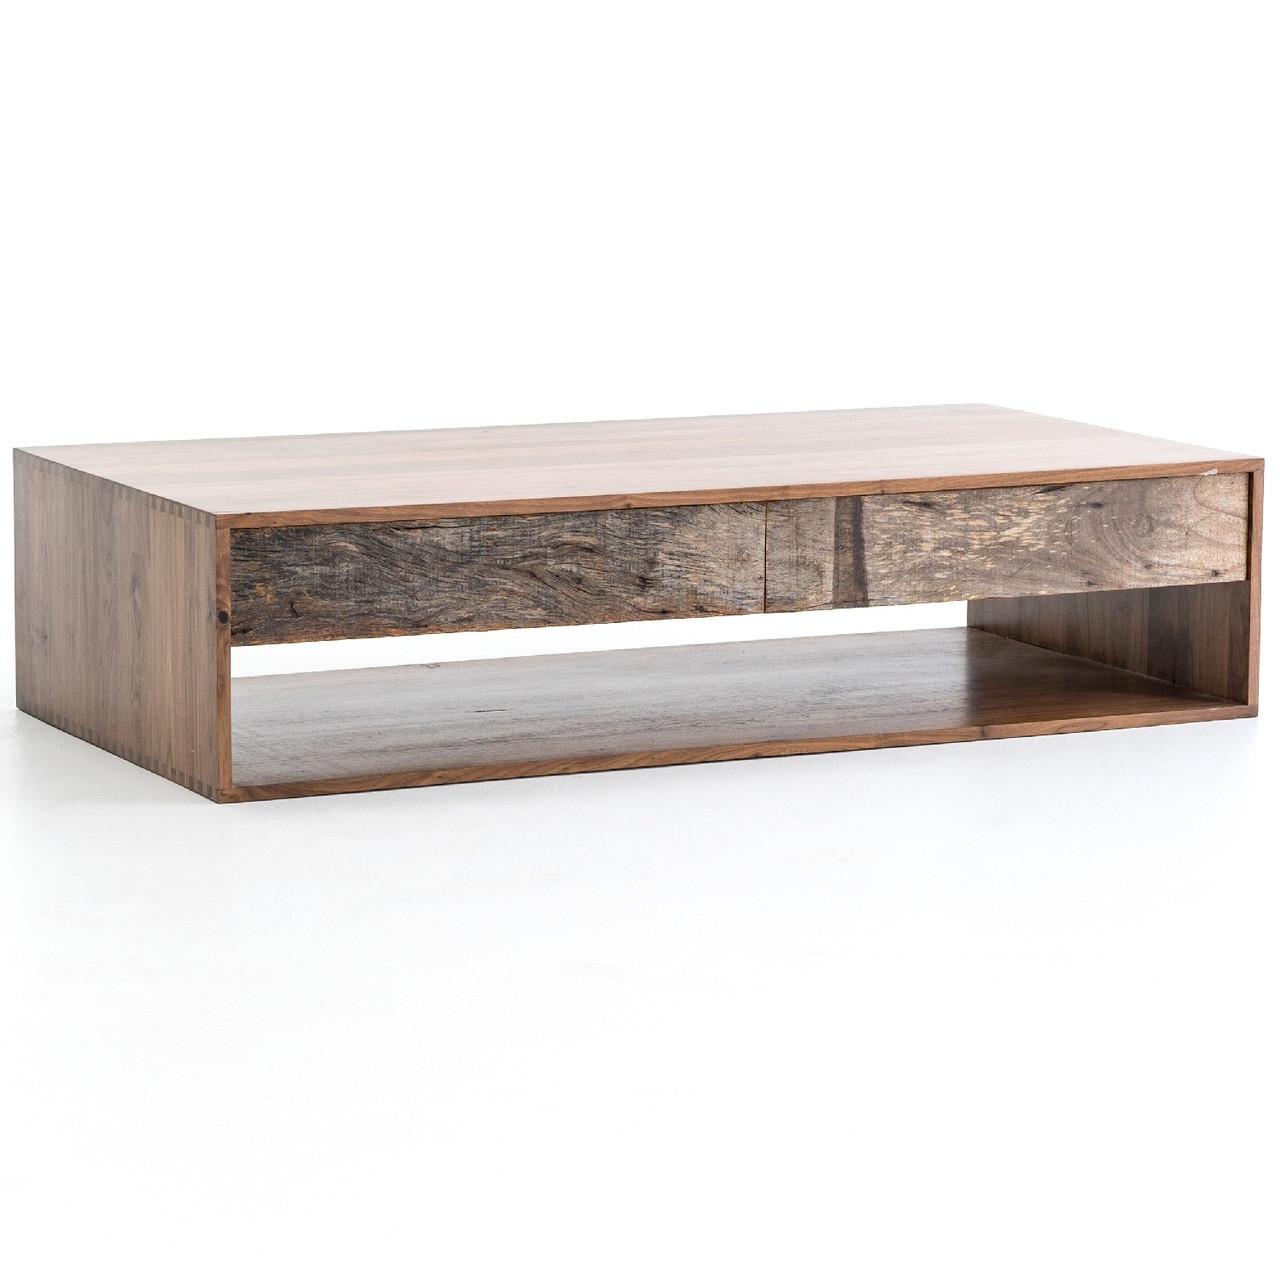 peroba wood furniture. Lucas Reclaimed Peroba Wood 2 Drawer Storage Coffee Table Furniture